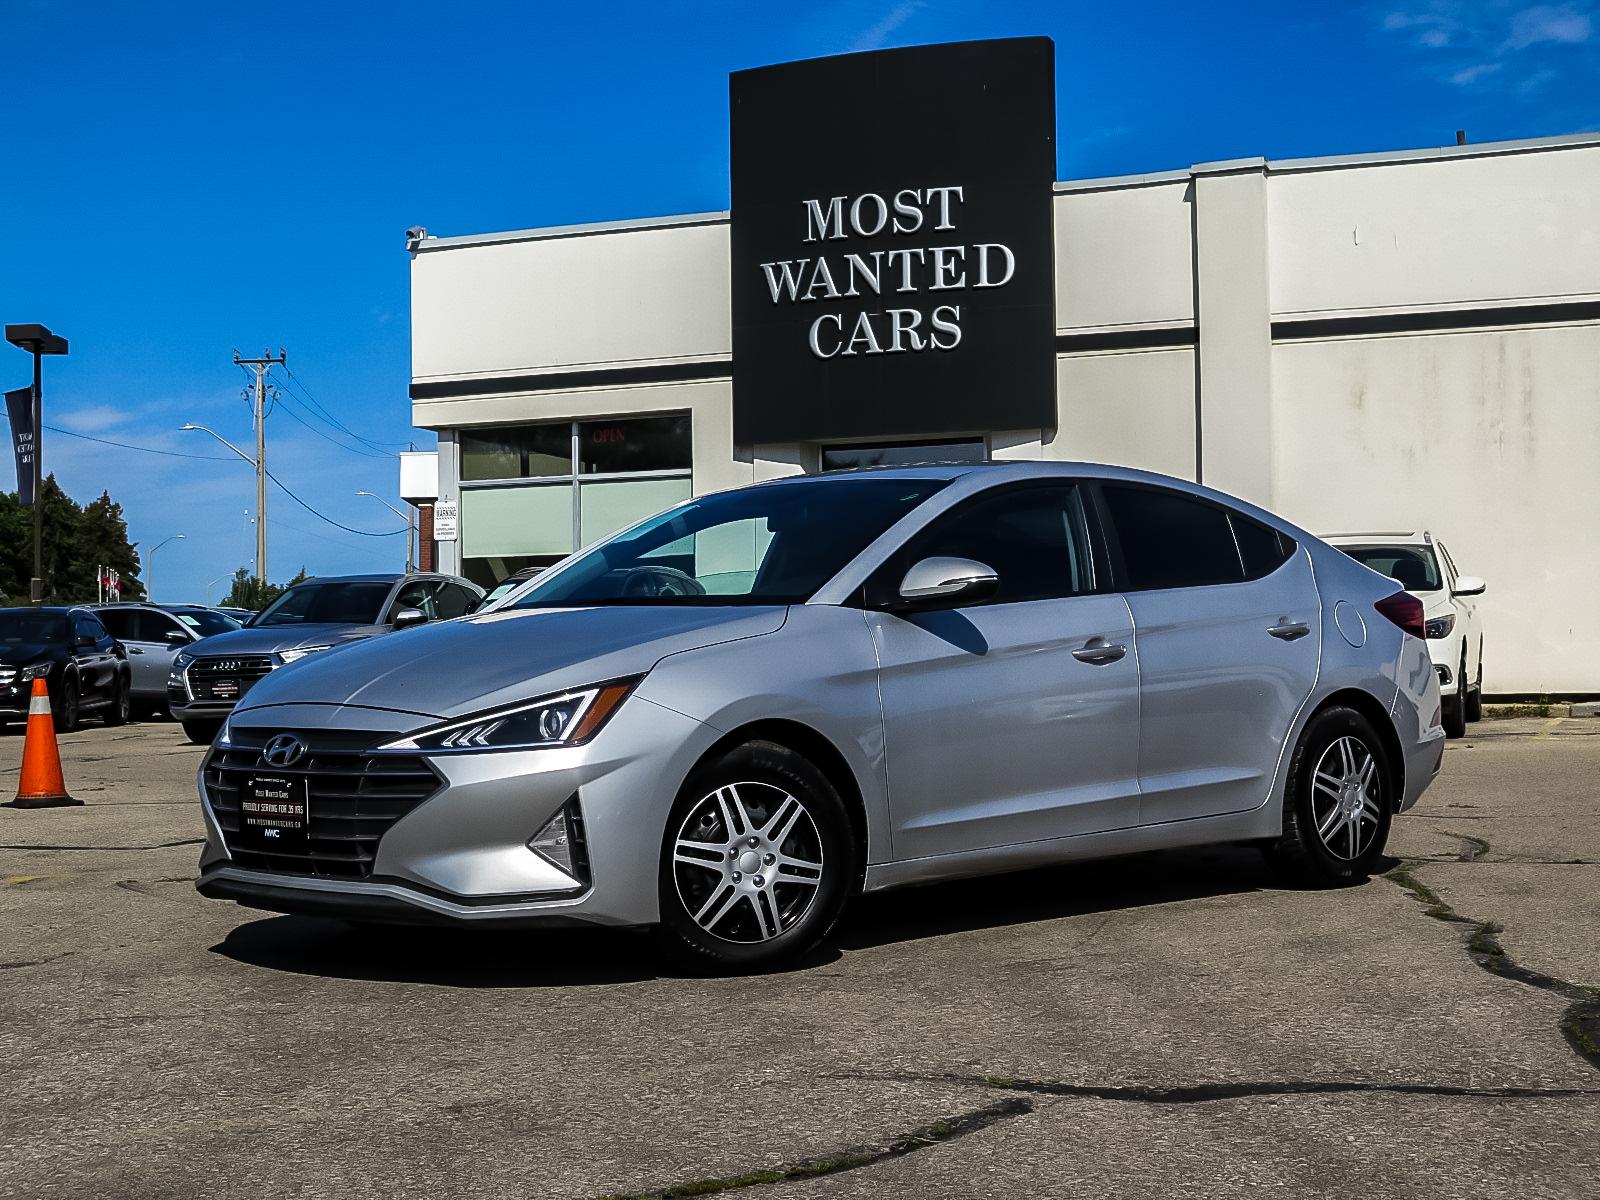 used 2019 Hyundai Elantra car, priced at $16,952